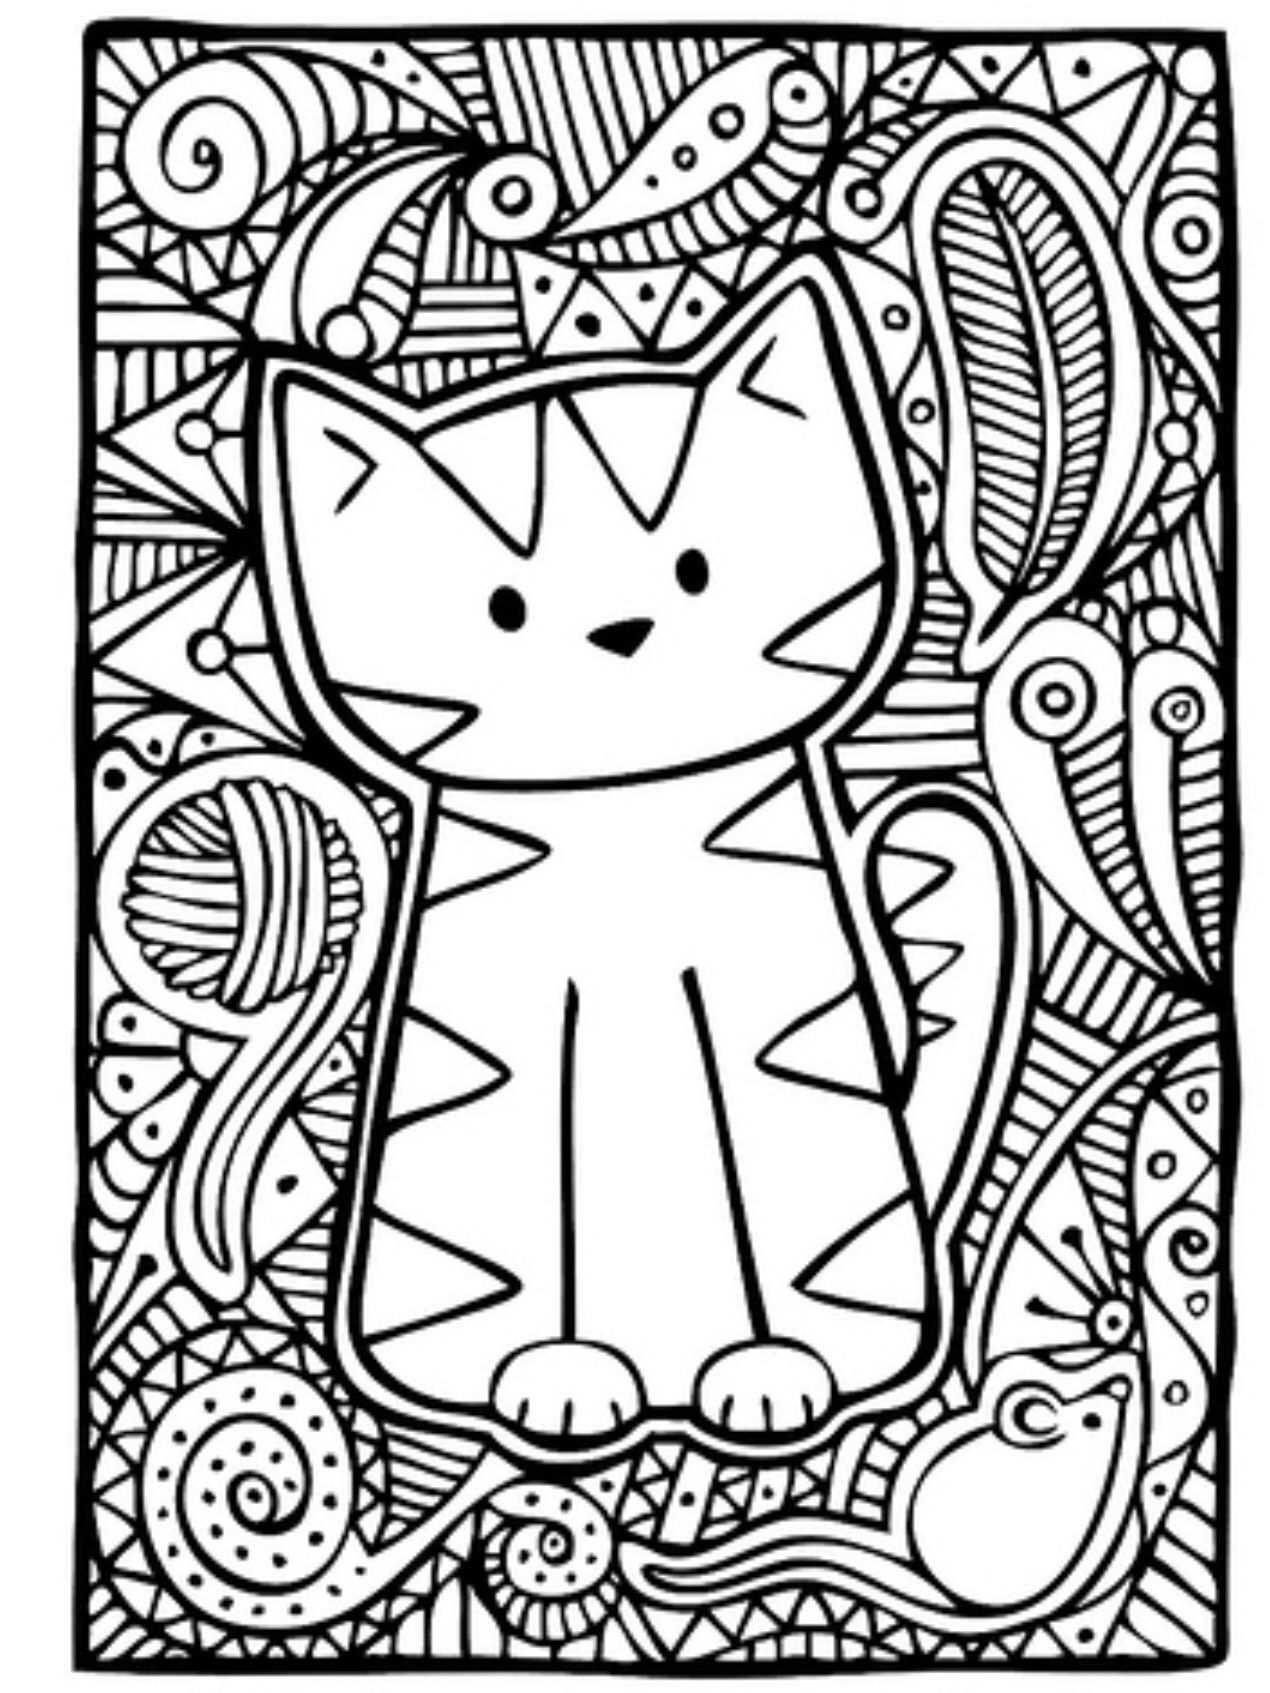 Kleurplaat Poes Kattenfeestje Kleurplaten Mandala Kleurplaten